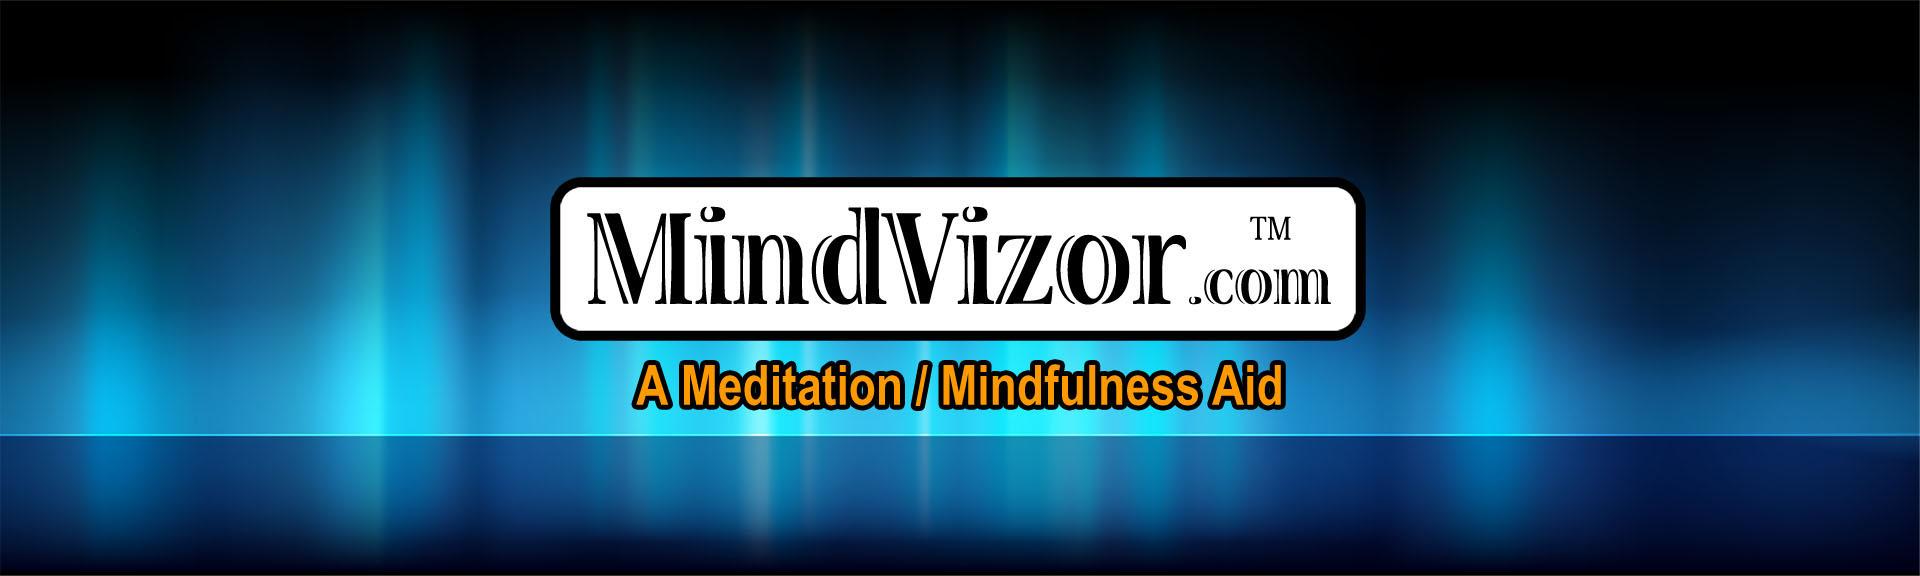 MindVizor.com